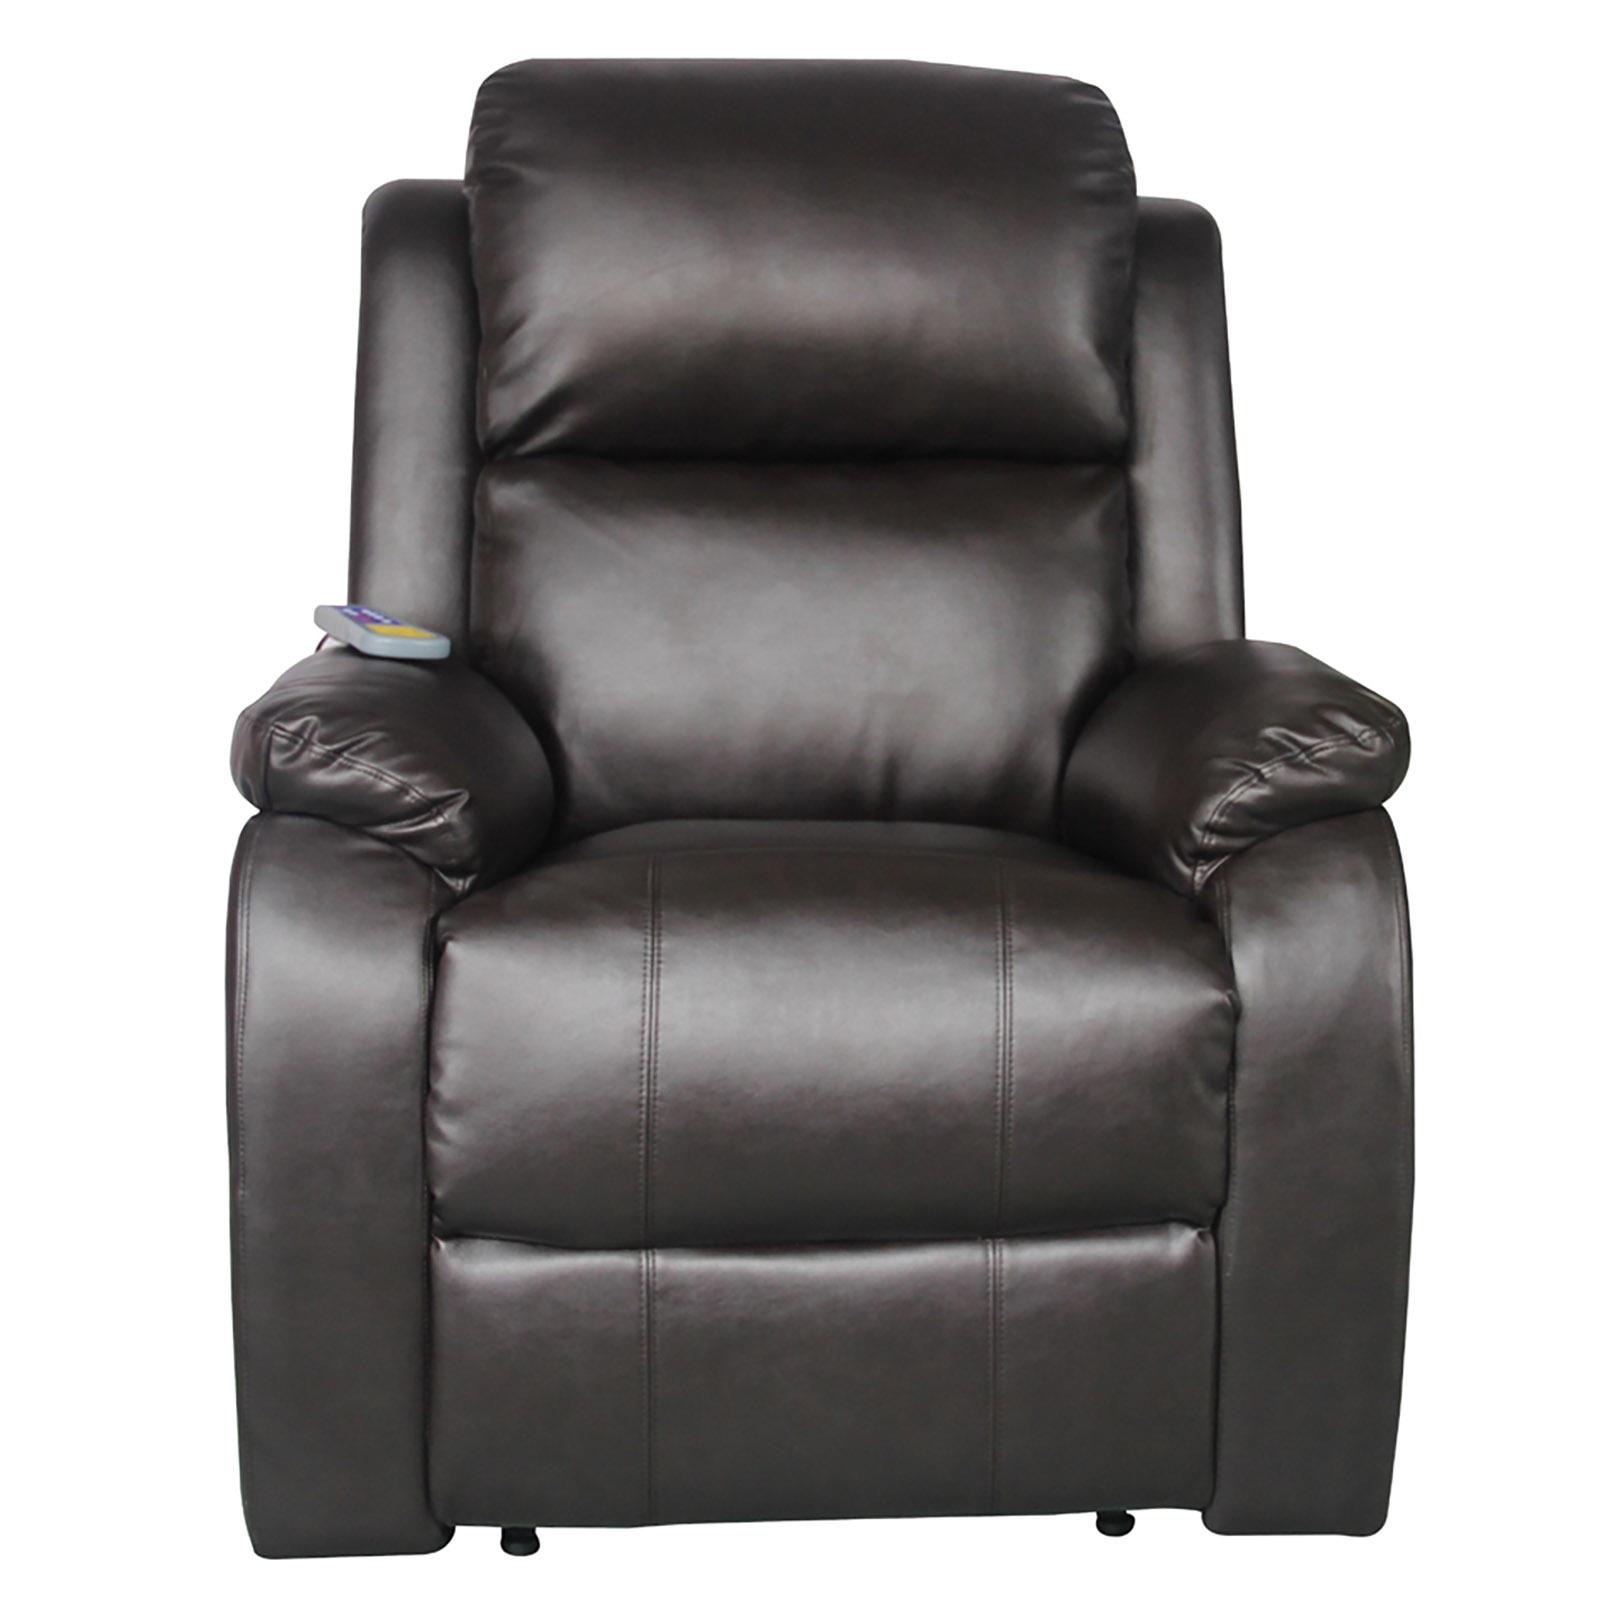 Fernsehsessel mit Heizung Massage Kunstleder Relaxsessel